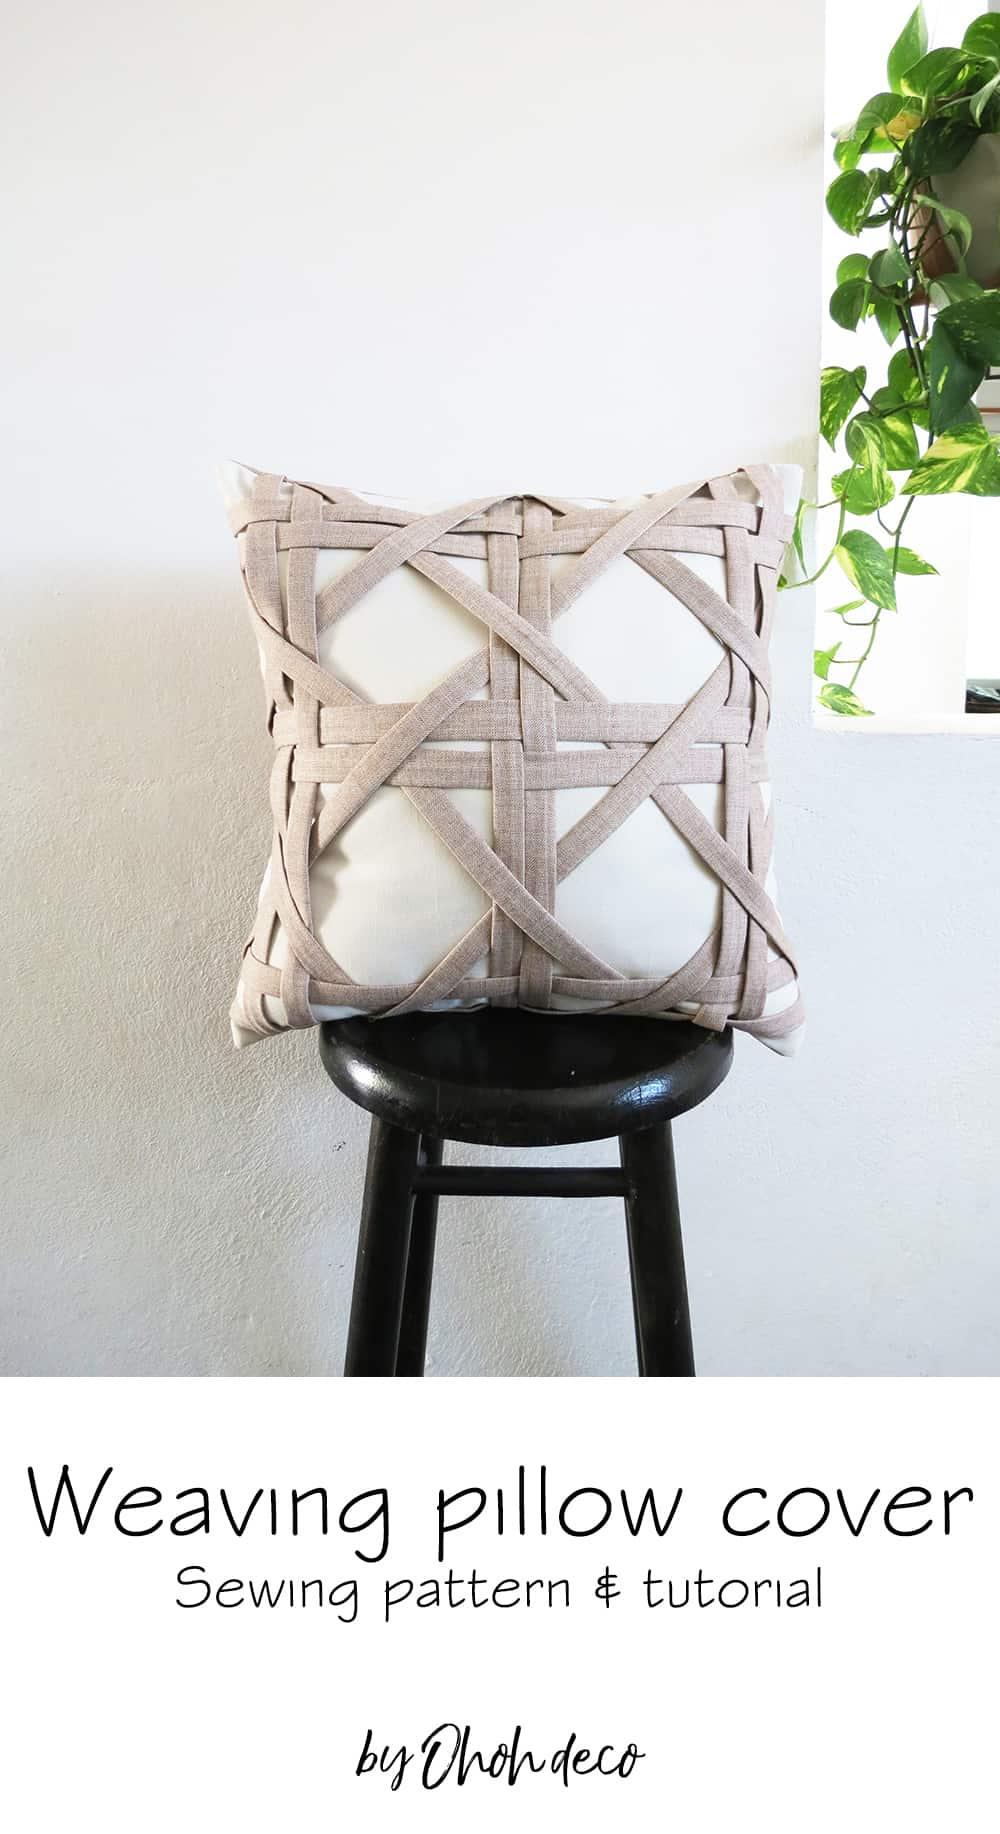 weaving pillow cover tutorial